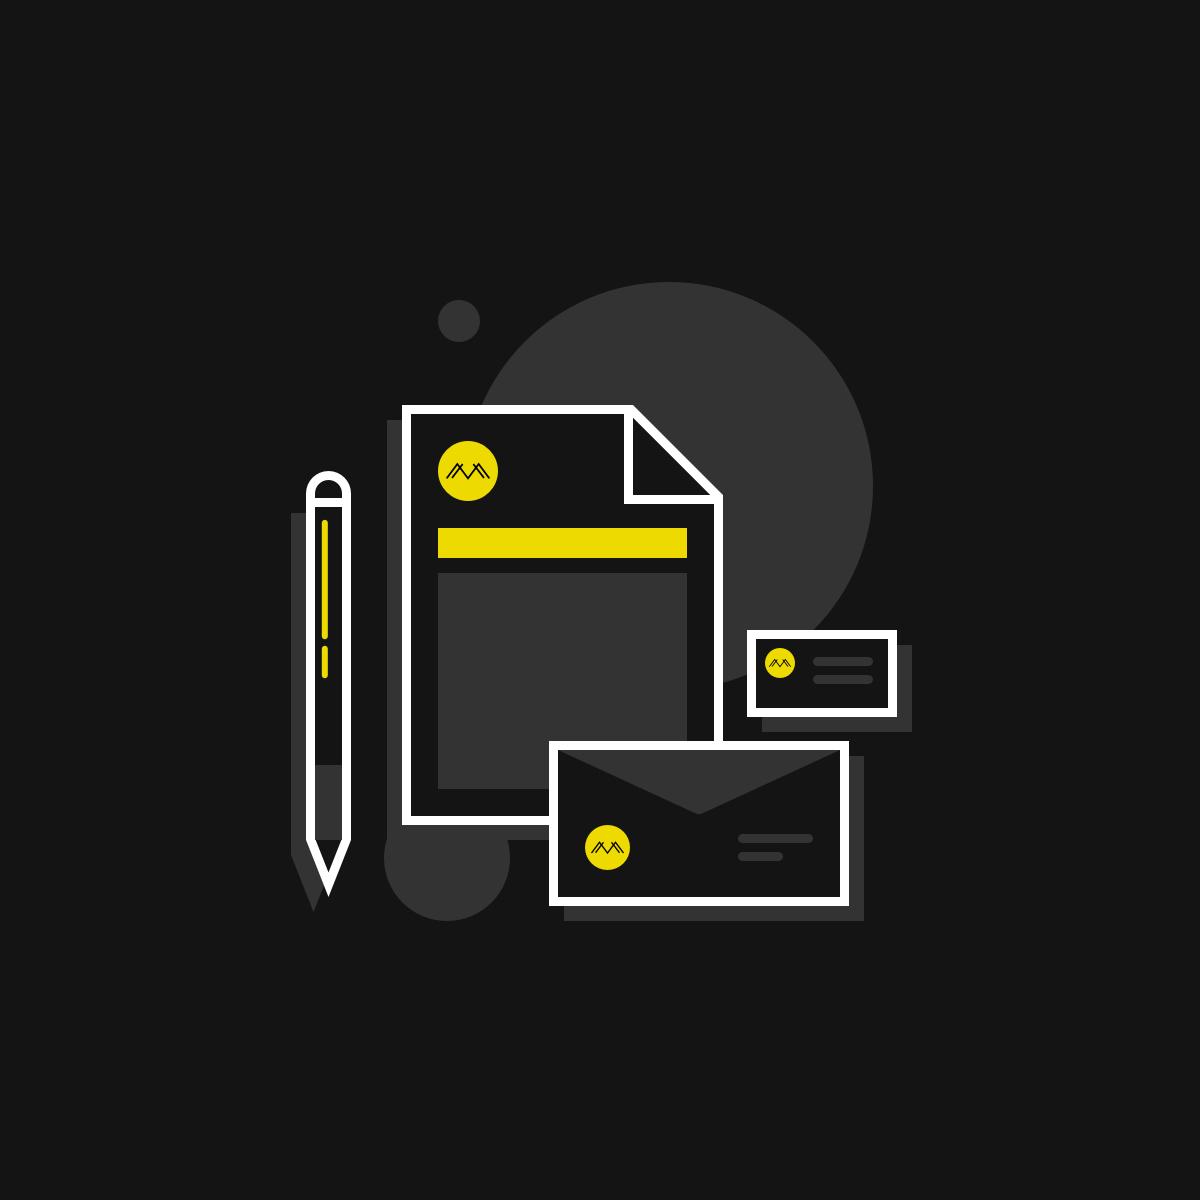 GRAY-icon-branding-black-base_gray_yellow@3x